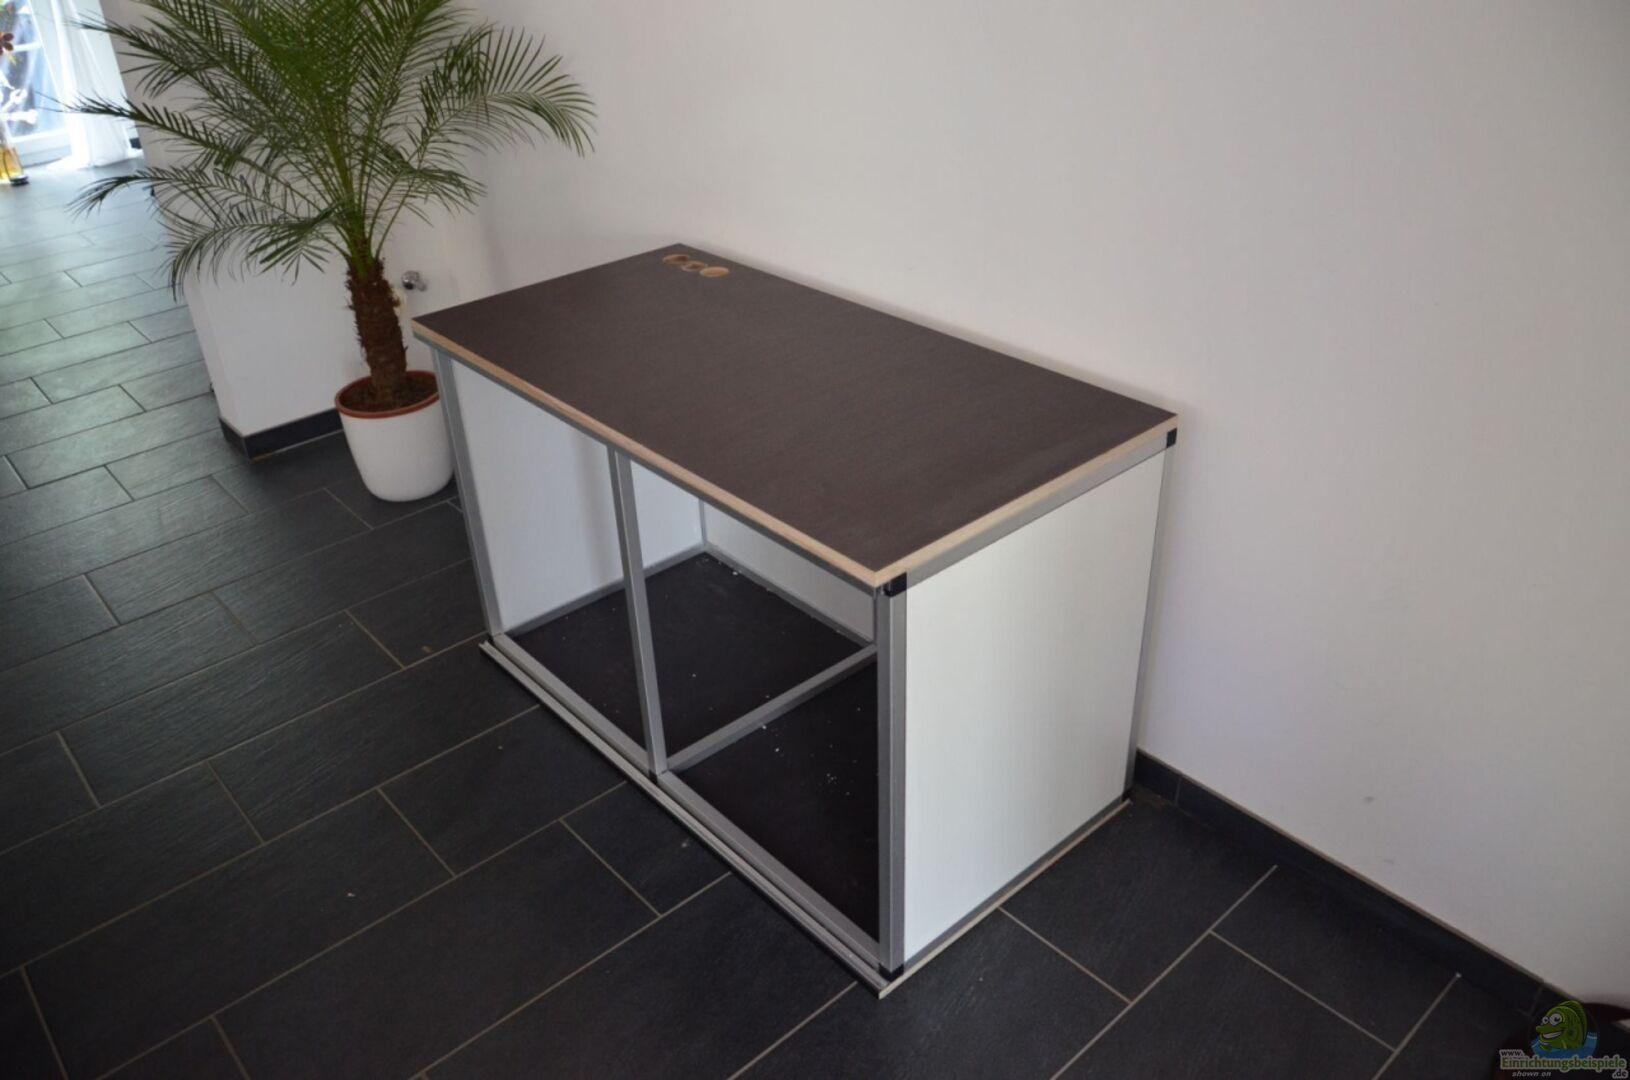 silikon auf holz top leo et lea ava mit holz silikon kugeln with silikon auf holz amazing holz. Black Bedroom Furniture Sets. Home Design Ideas